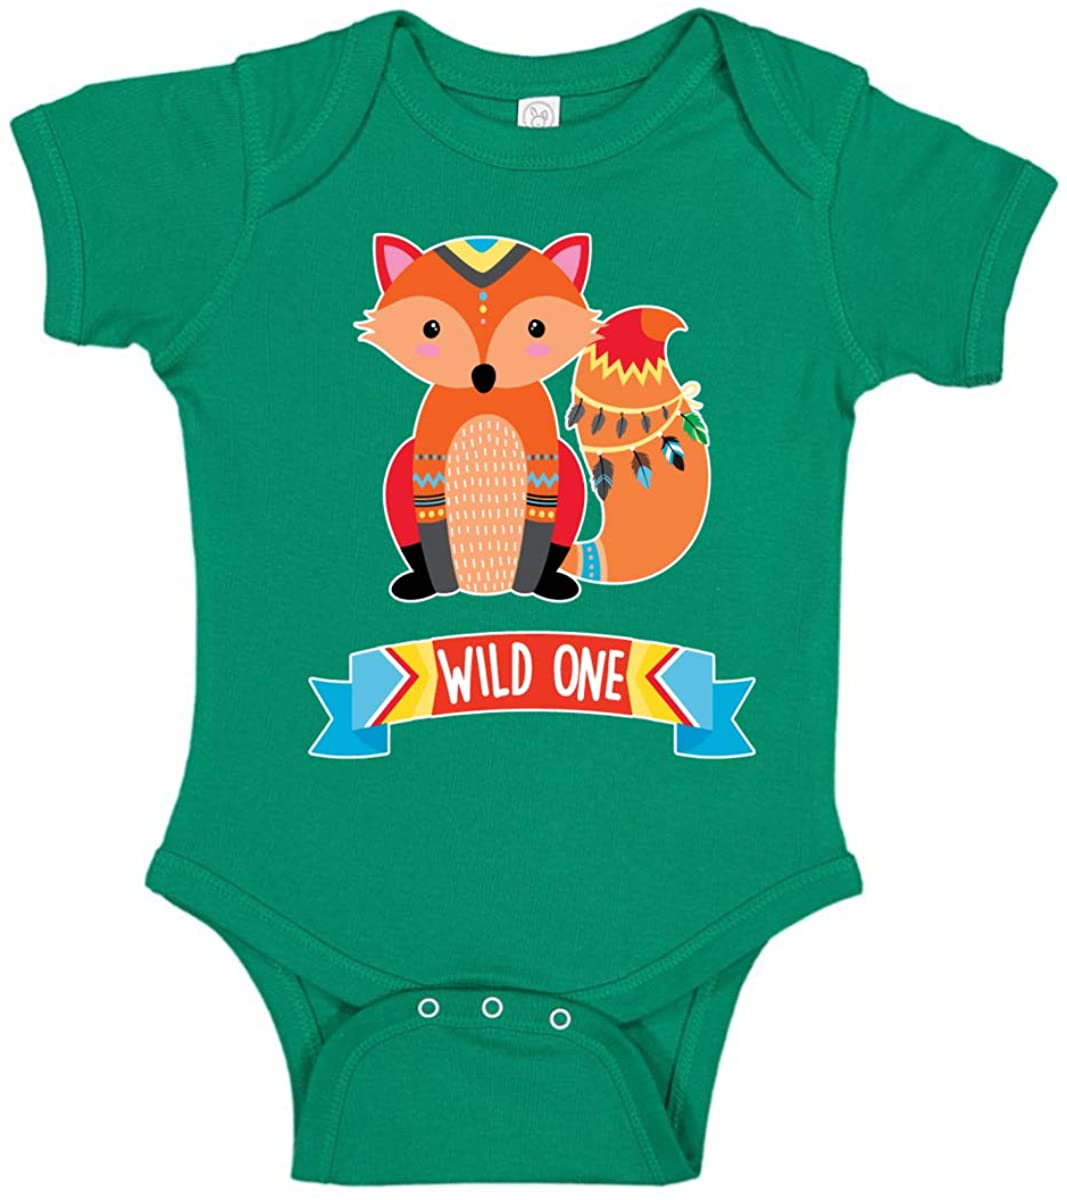 Wild One Funny Gift Idea Humor Baby Creeper Boys Girls Infant Bodysuit